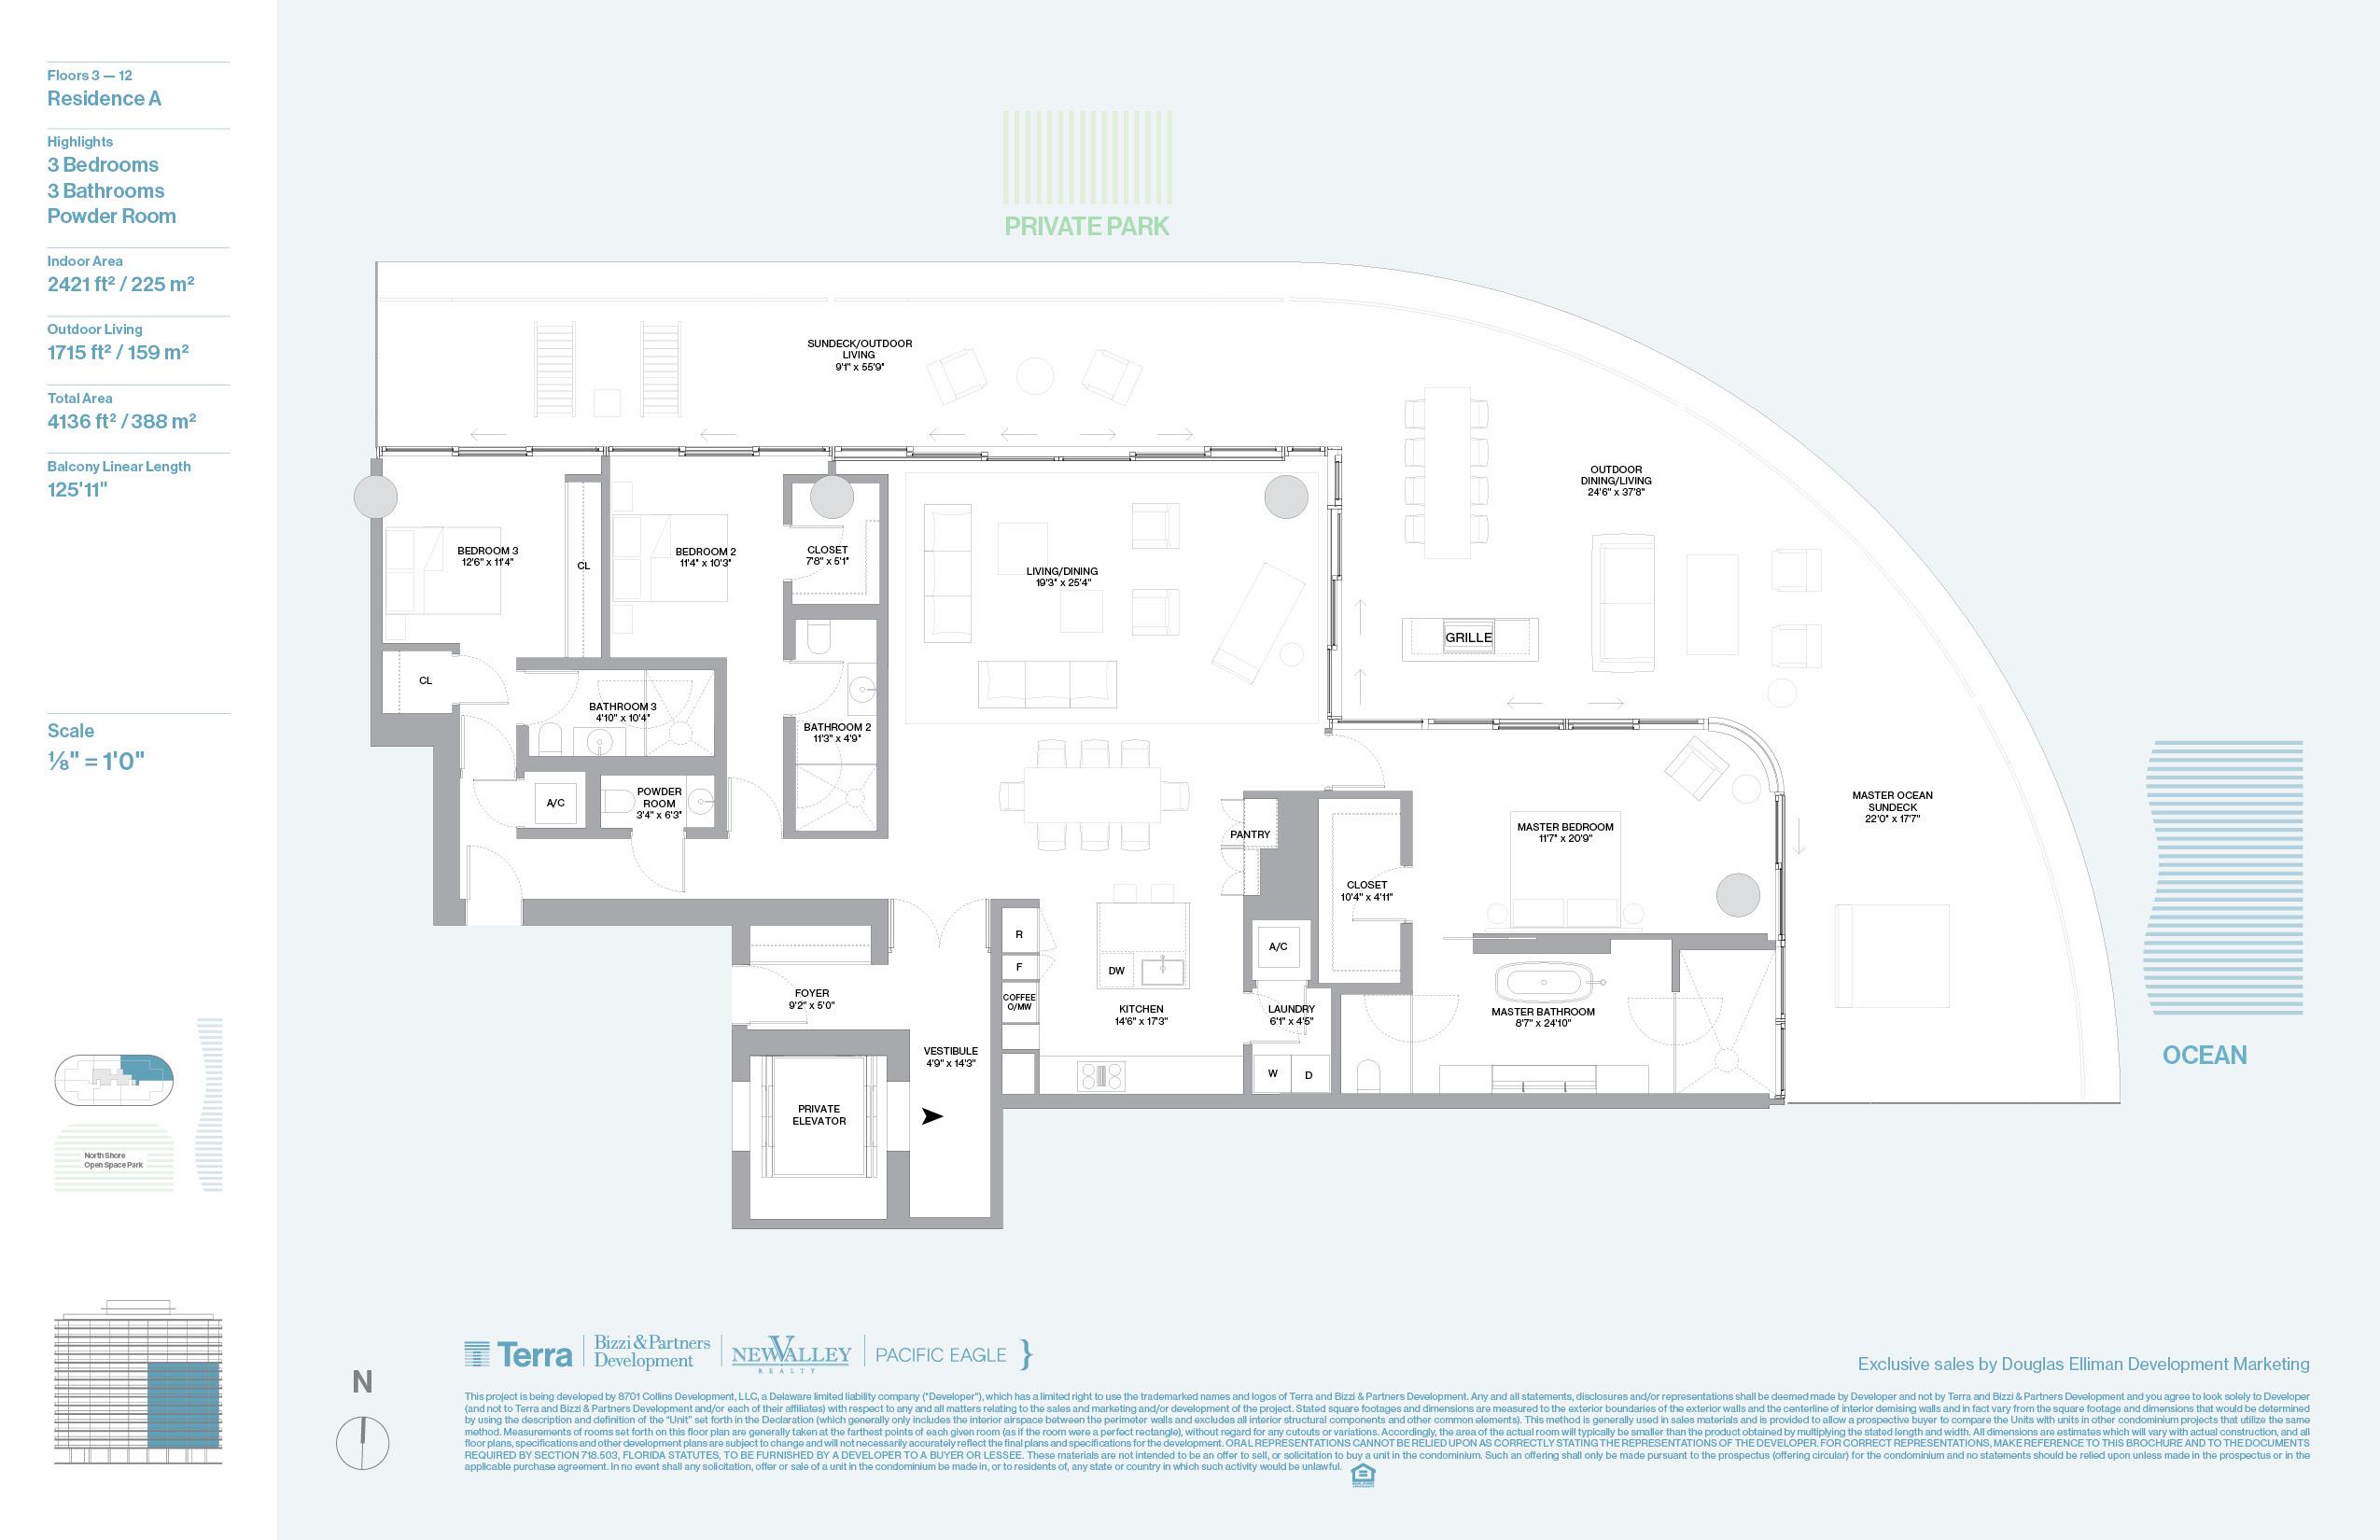 87 Park Residence A